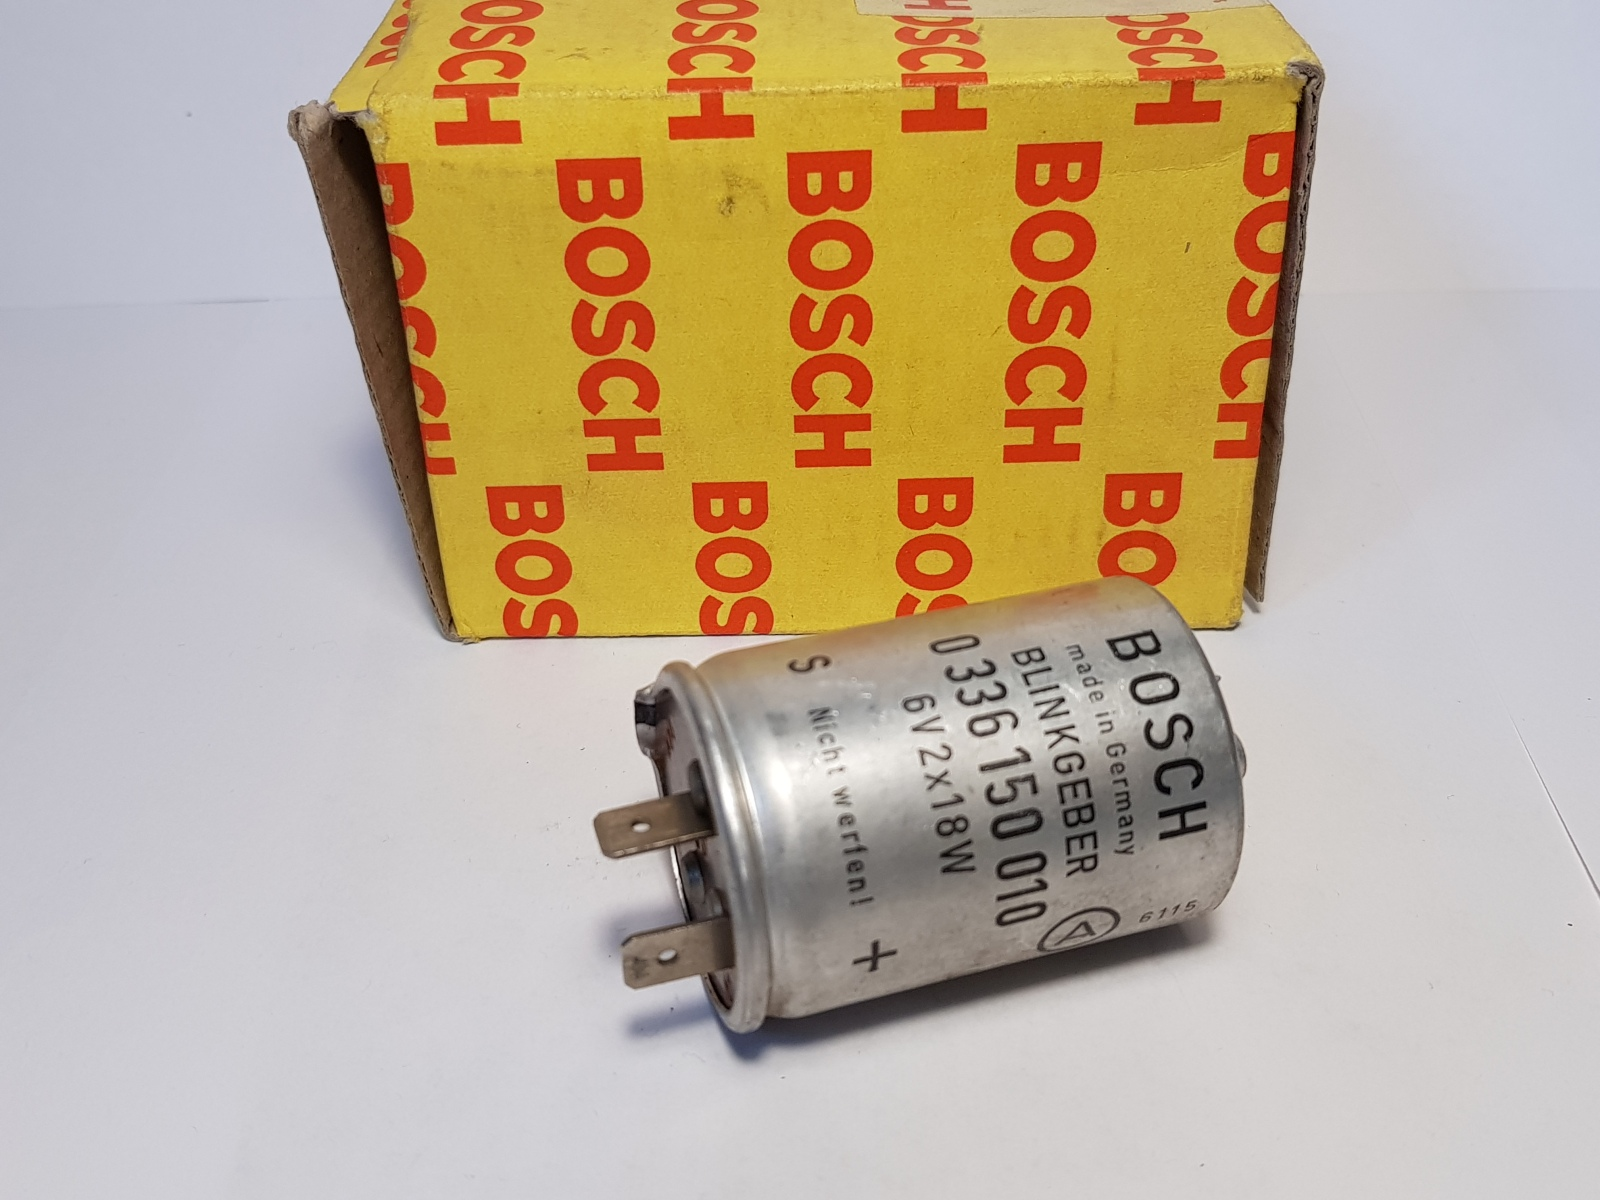 Bosch 0336150010 Blinkgeber Blinkergeber 6V 2x18W Elektrisch Indicator Unit